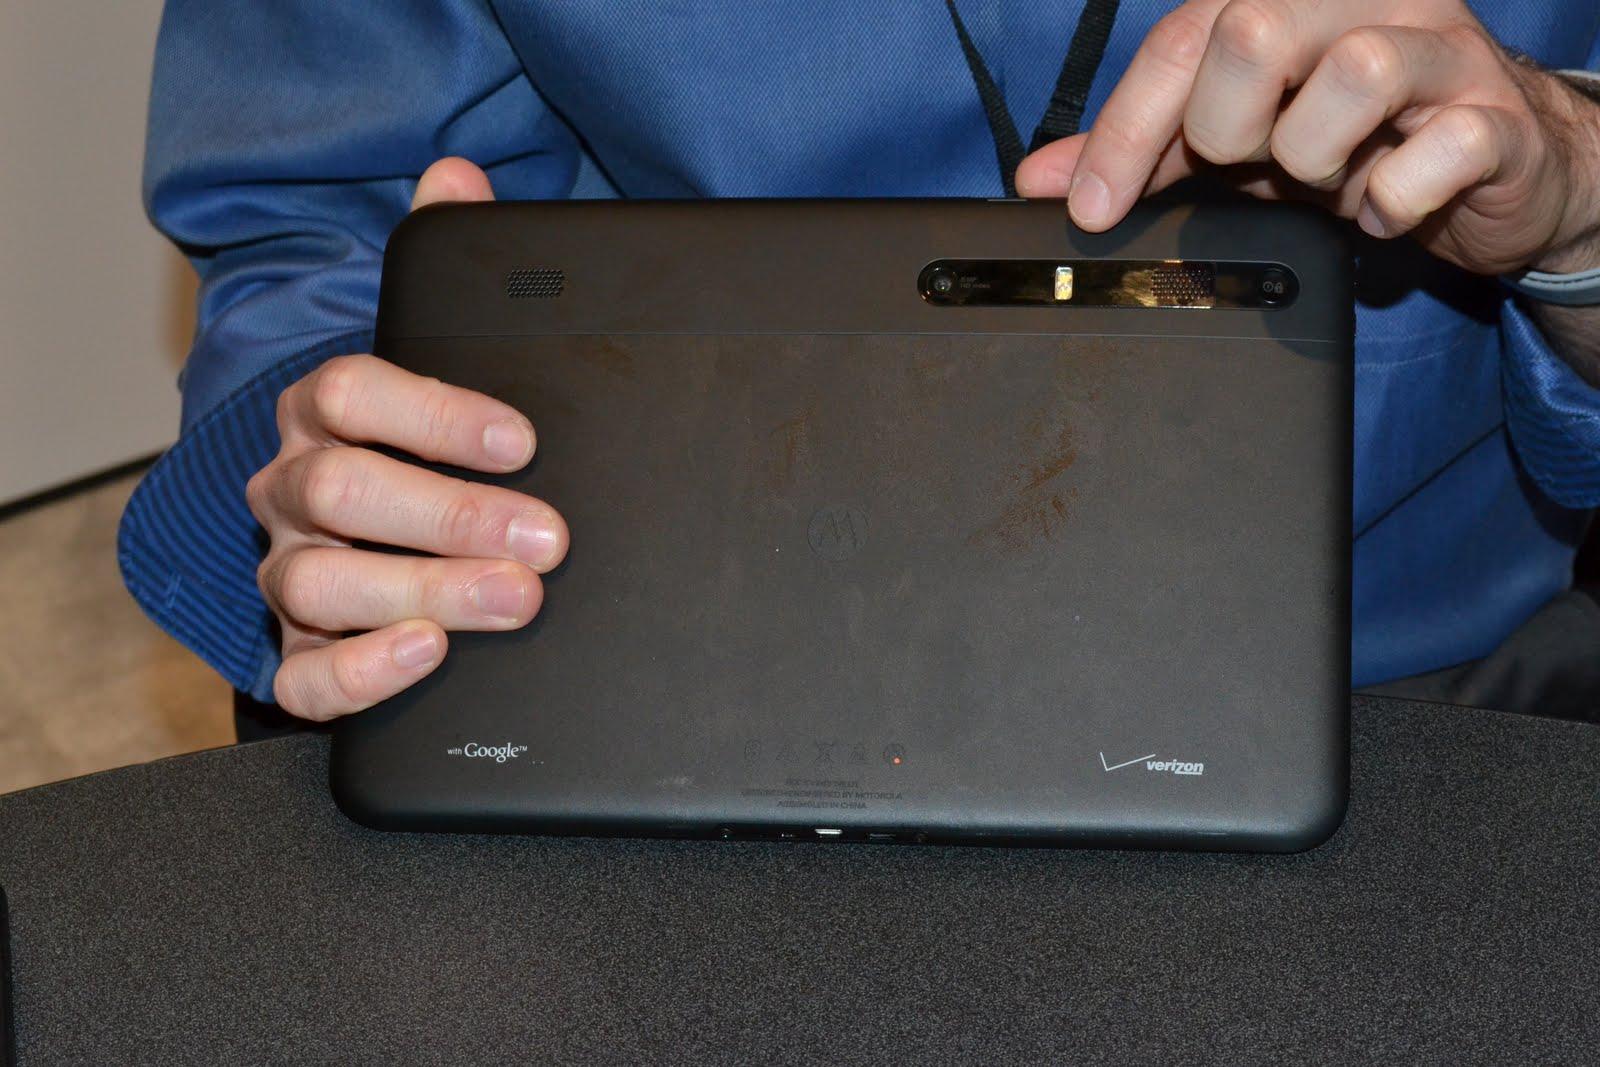 http://3.bp.blogspot.com/-eFWj9BowF4g/Thmmx8rz6YI/AAAAAAAABBA/6pEg3Z2fH1A/s1600/motorola-xoom-tablet-back-ces-2011.jpg